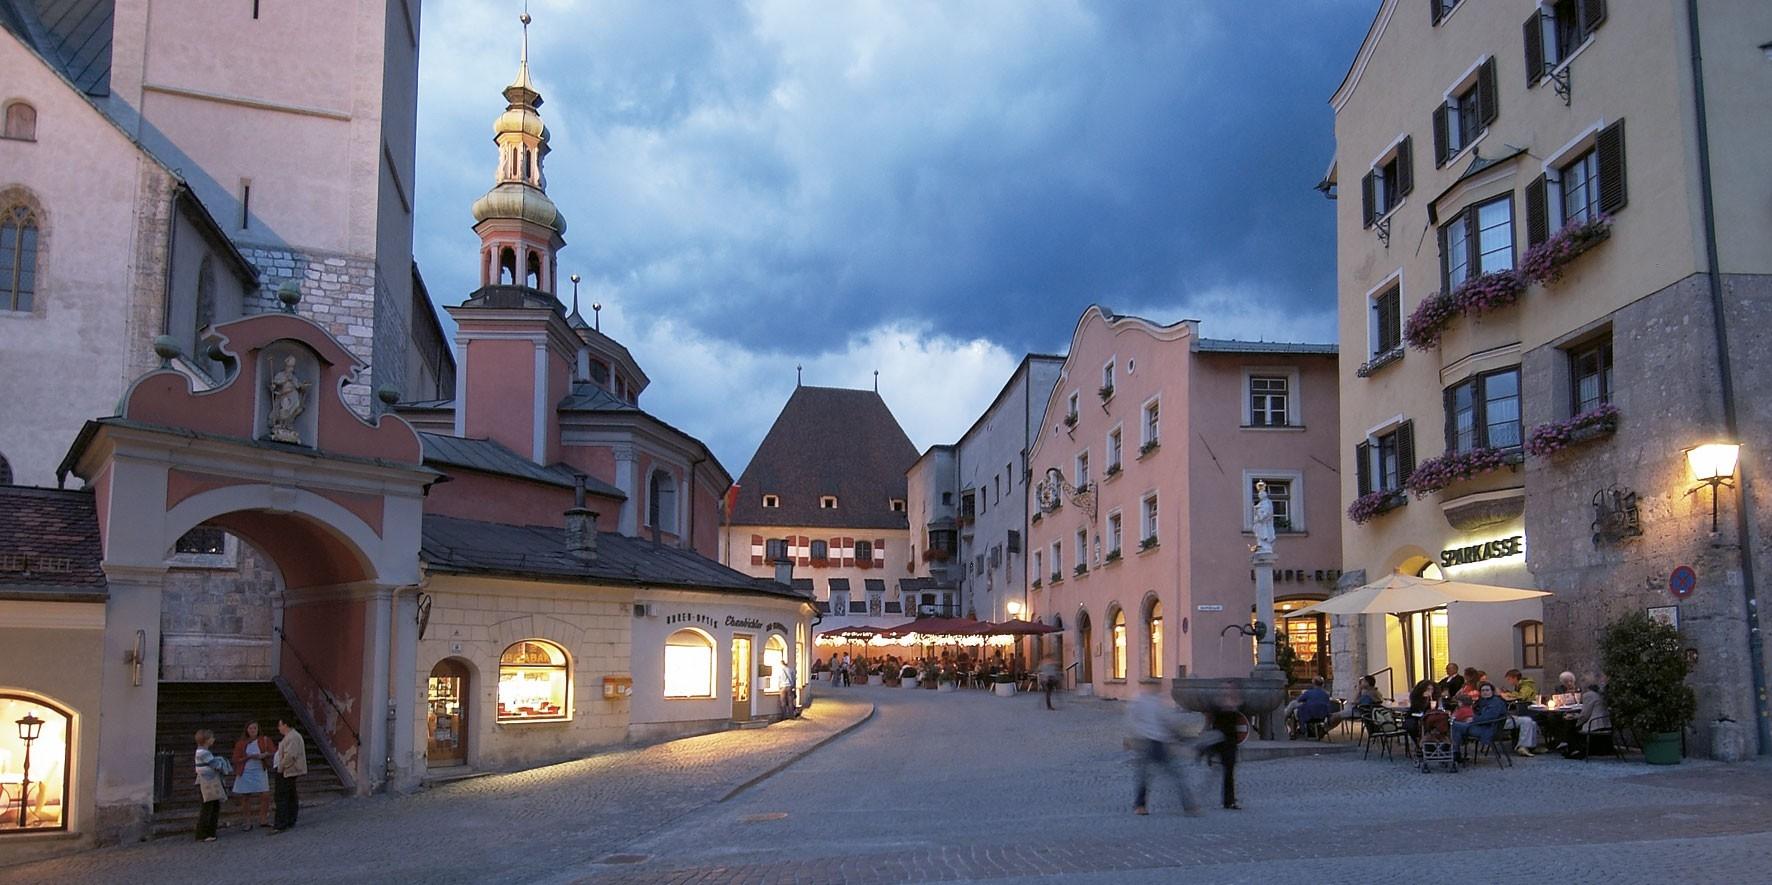 Oberer-Stadtplatz-Hall-in-Tirol_Watzek